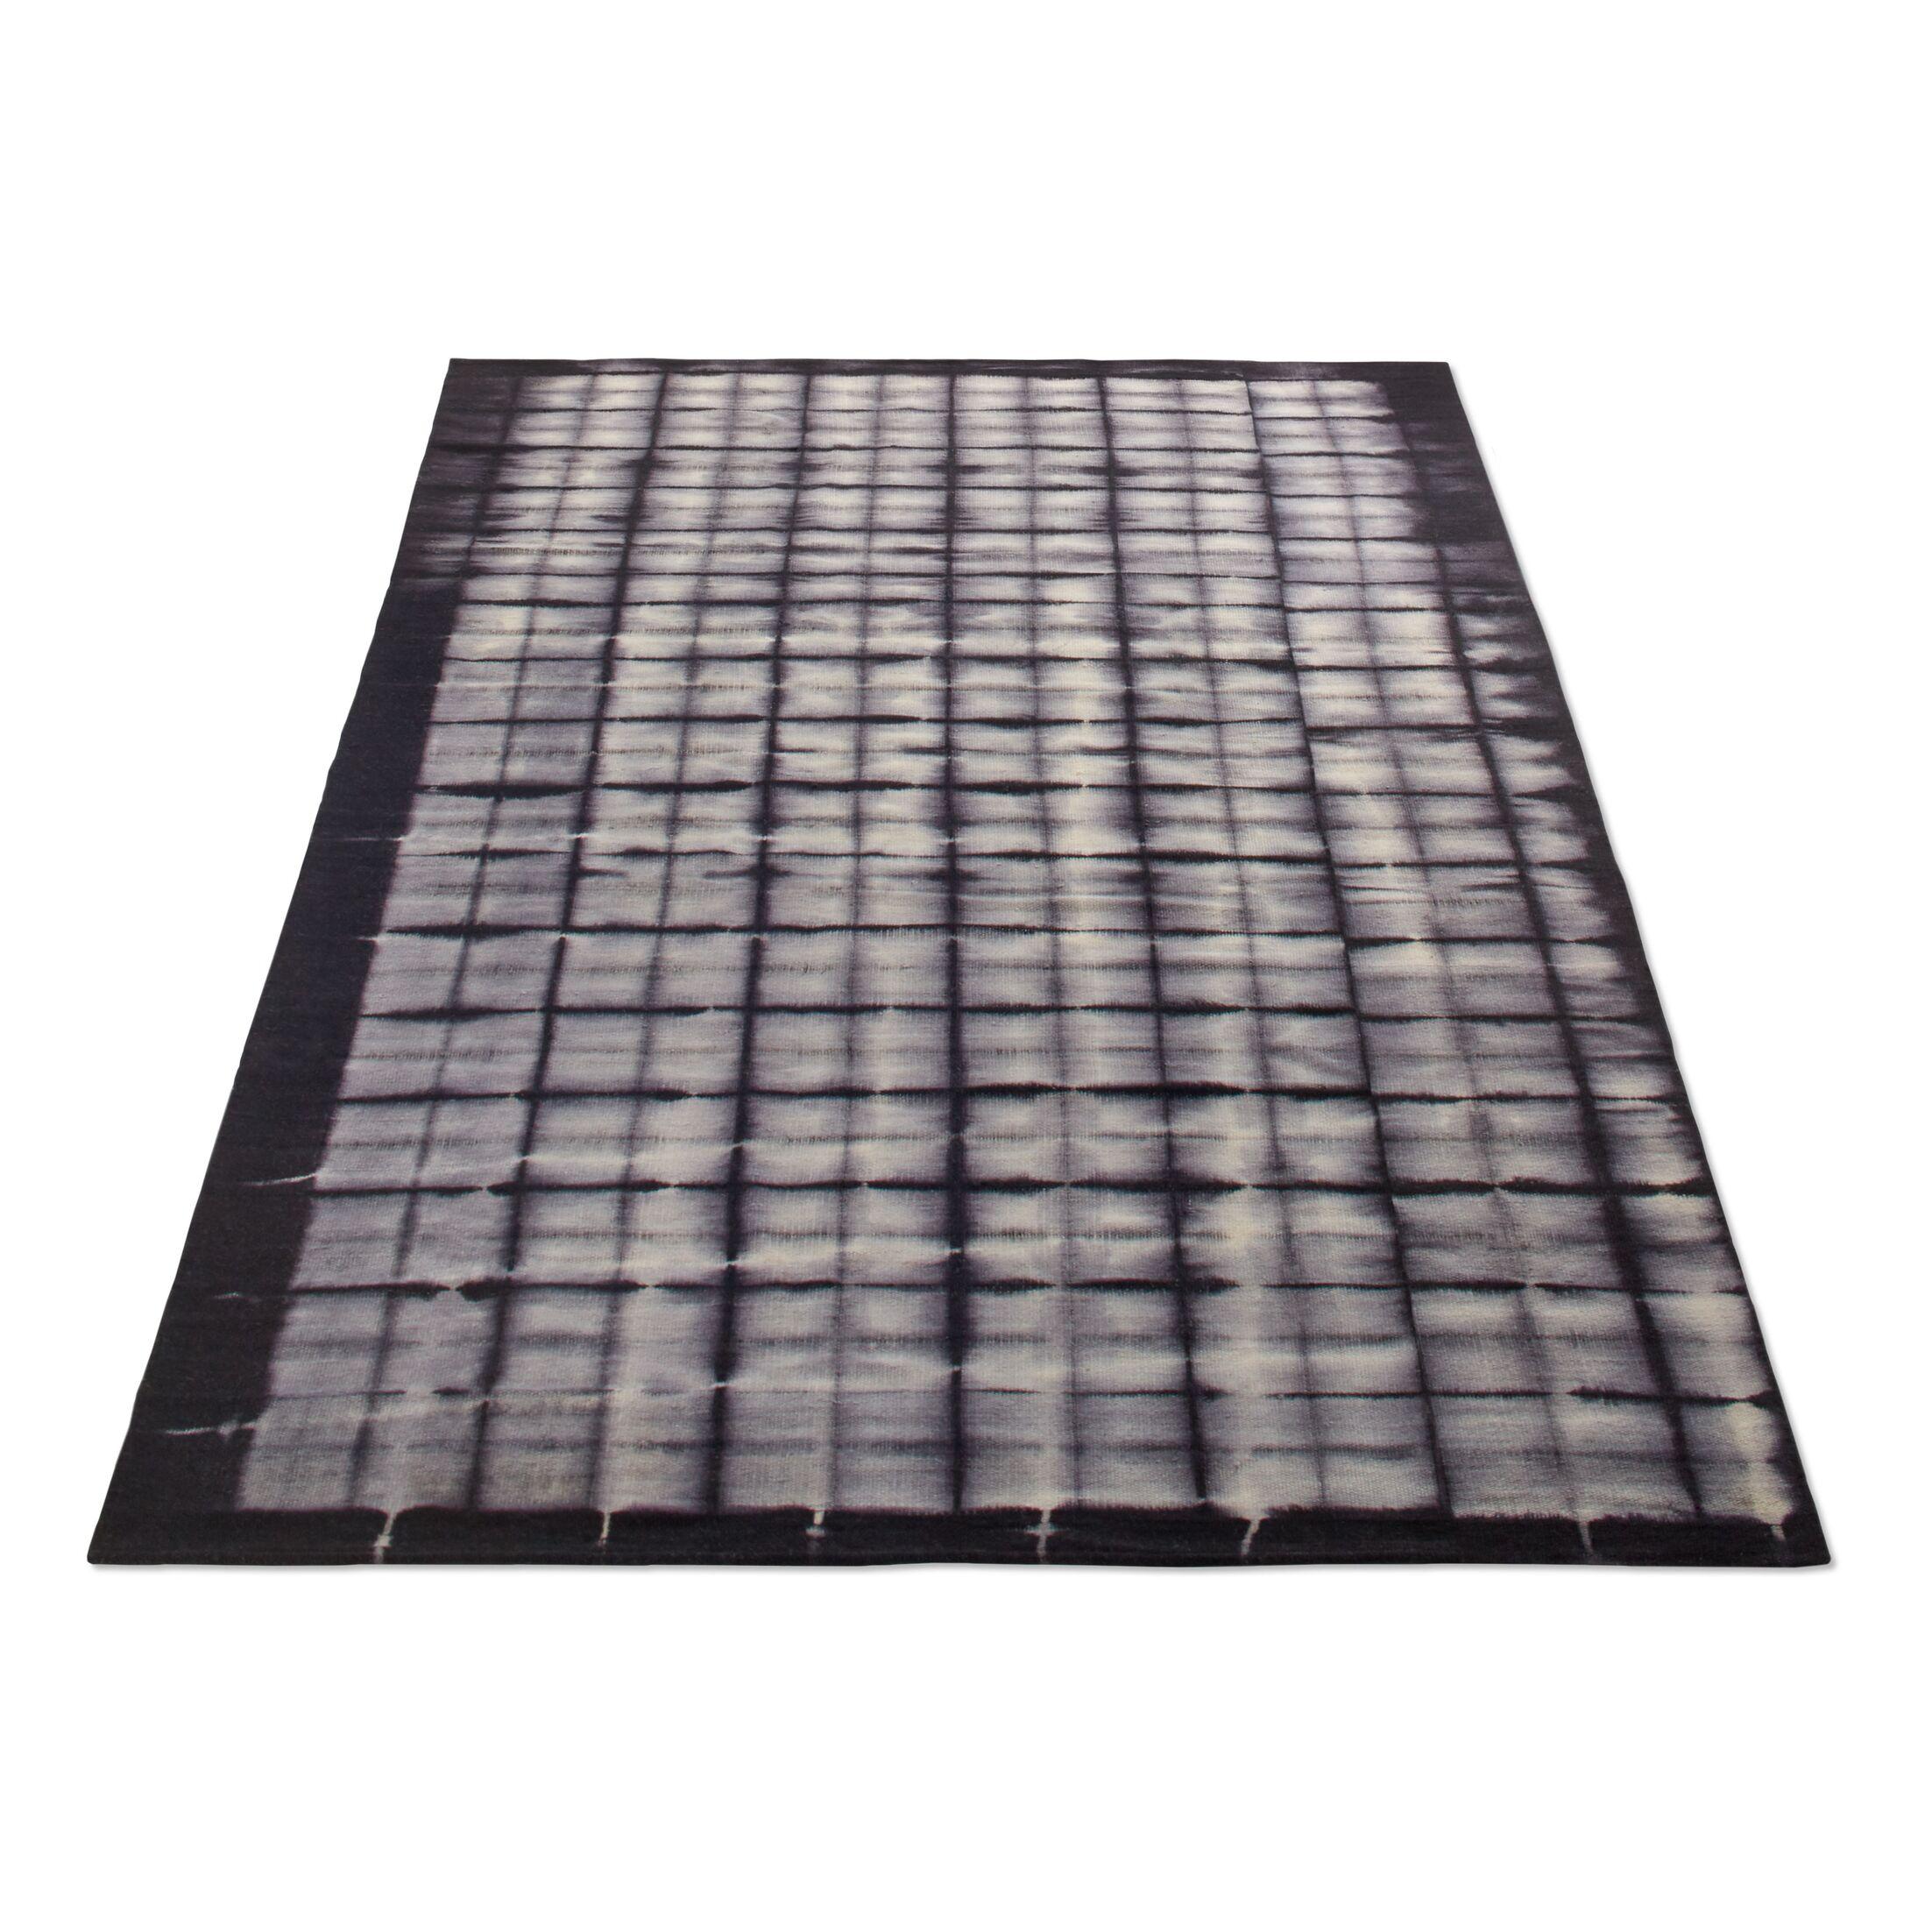 Murl Hand-Woven Wool Black Area Rug Rug Size: 5' x 8'